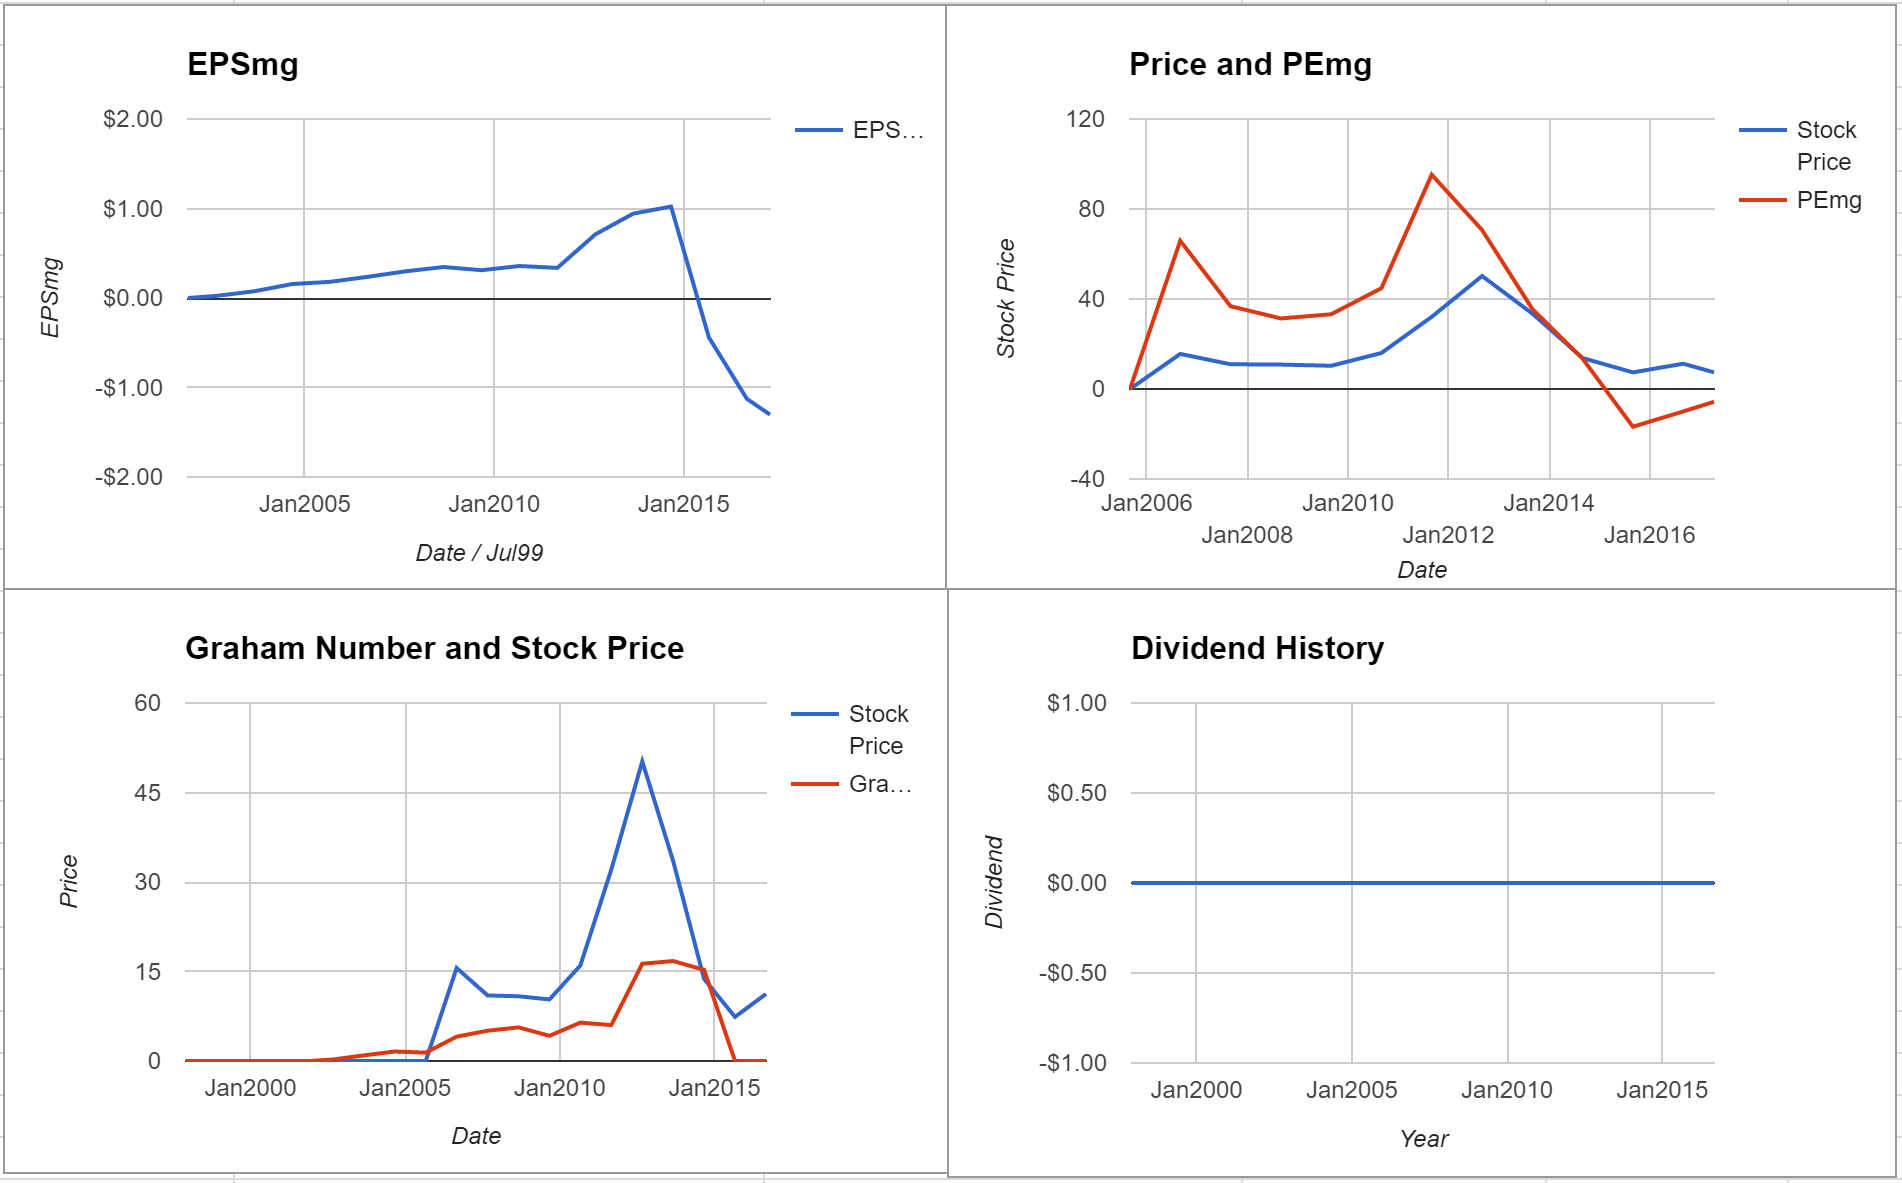 Liquidity Services Inc Valuation – Initial Coverage $LQDT